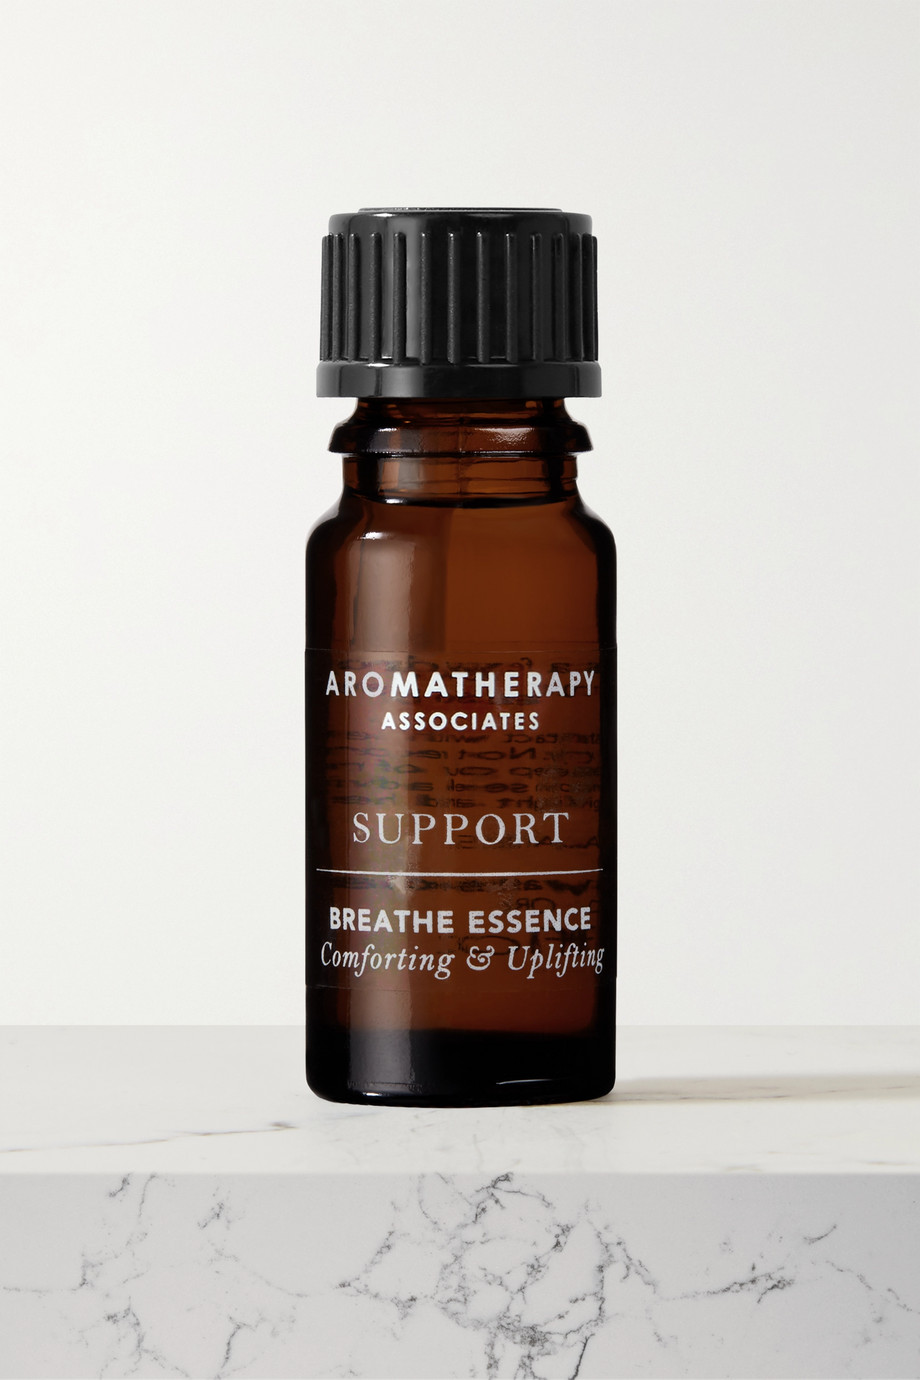 Aromatherapy Associates Support Breathe Essence, 10 ml – Inhalationsöl